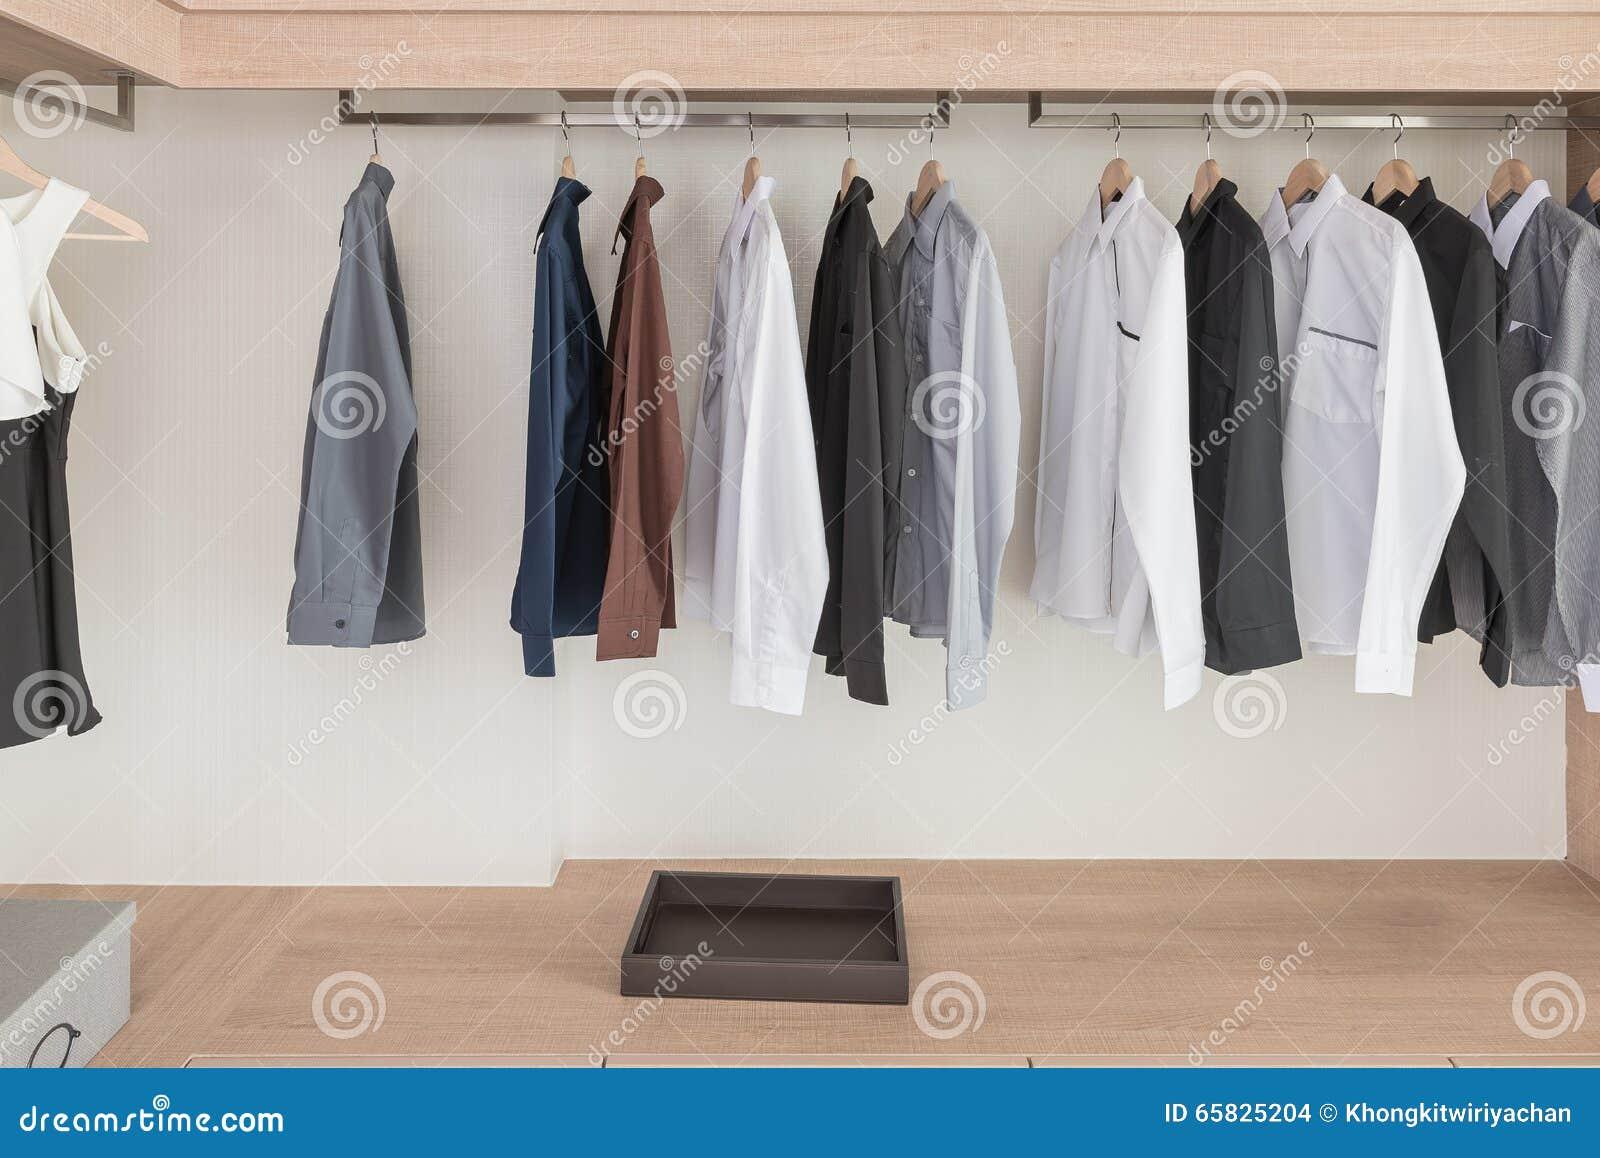 garderobe zum h ngen haloring. Black Bedroom Furniture Sets. Home Design Ideas